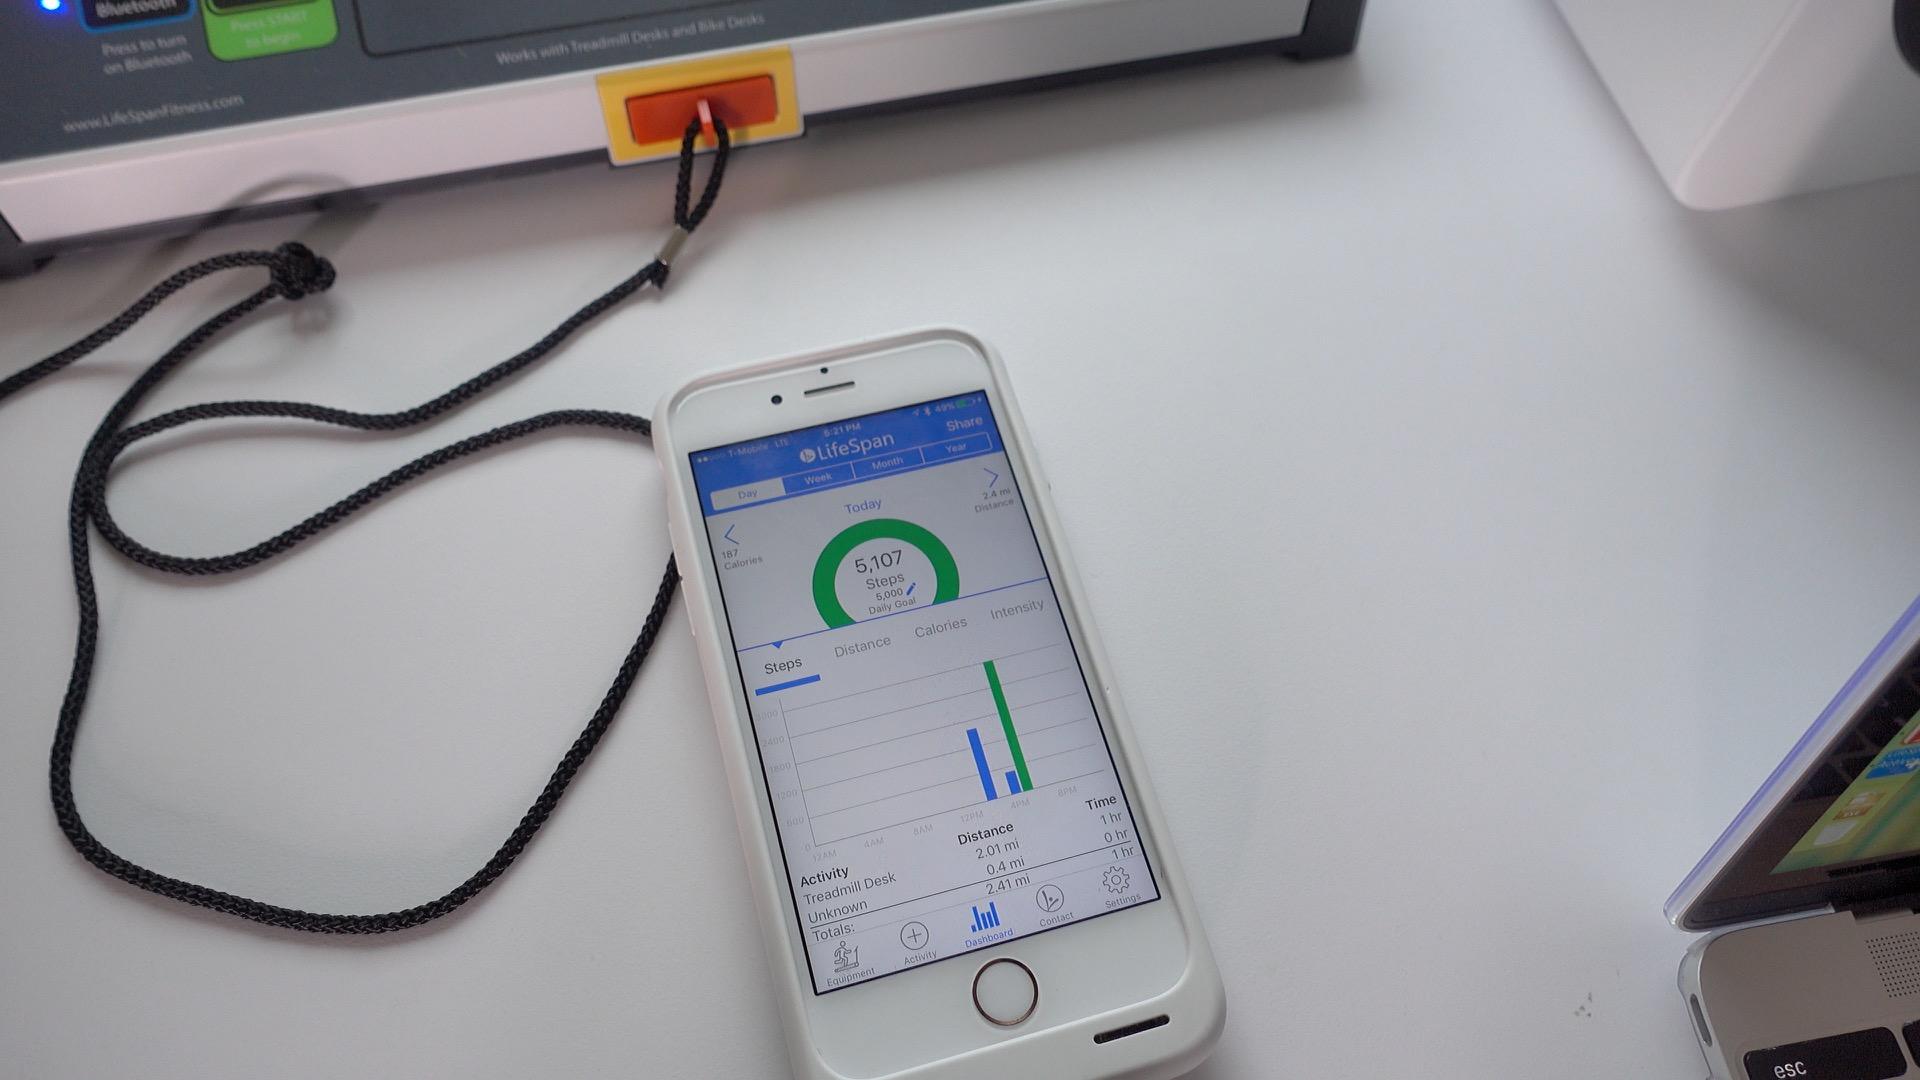 UnderDesk Treadmill LifeSpan app